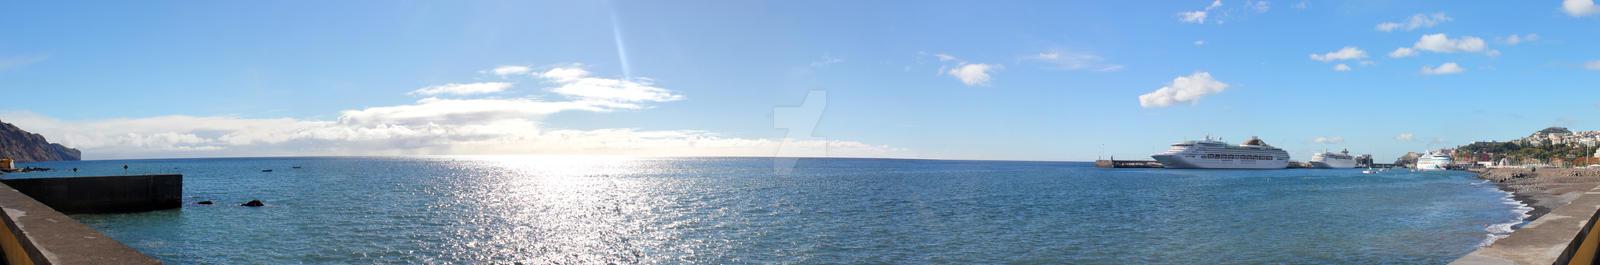 Madeira Coast Panorama